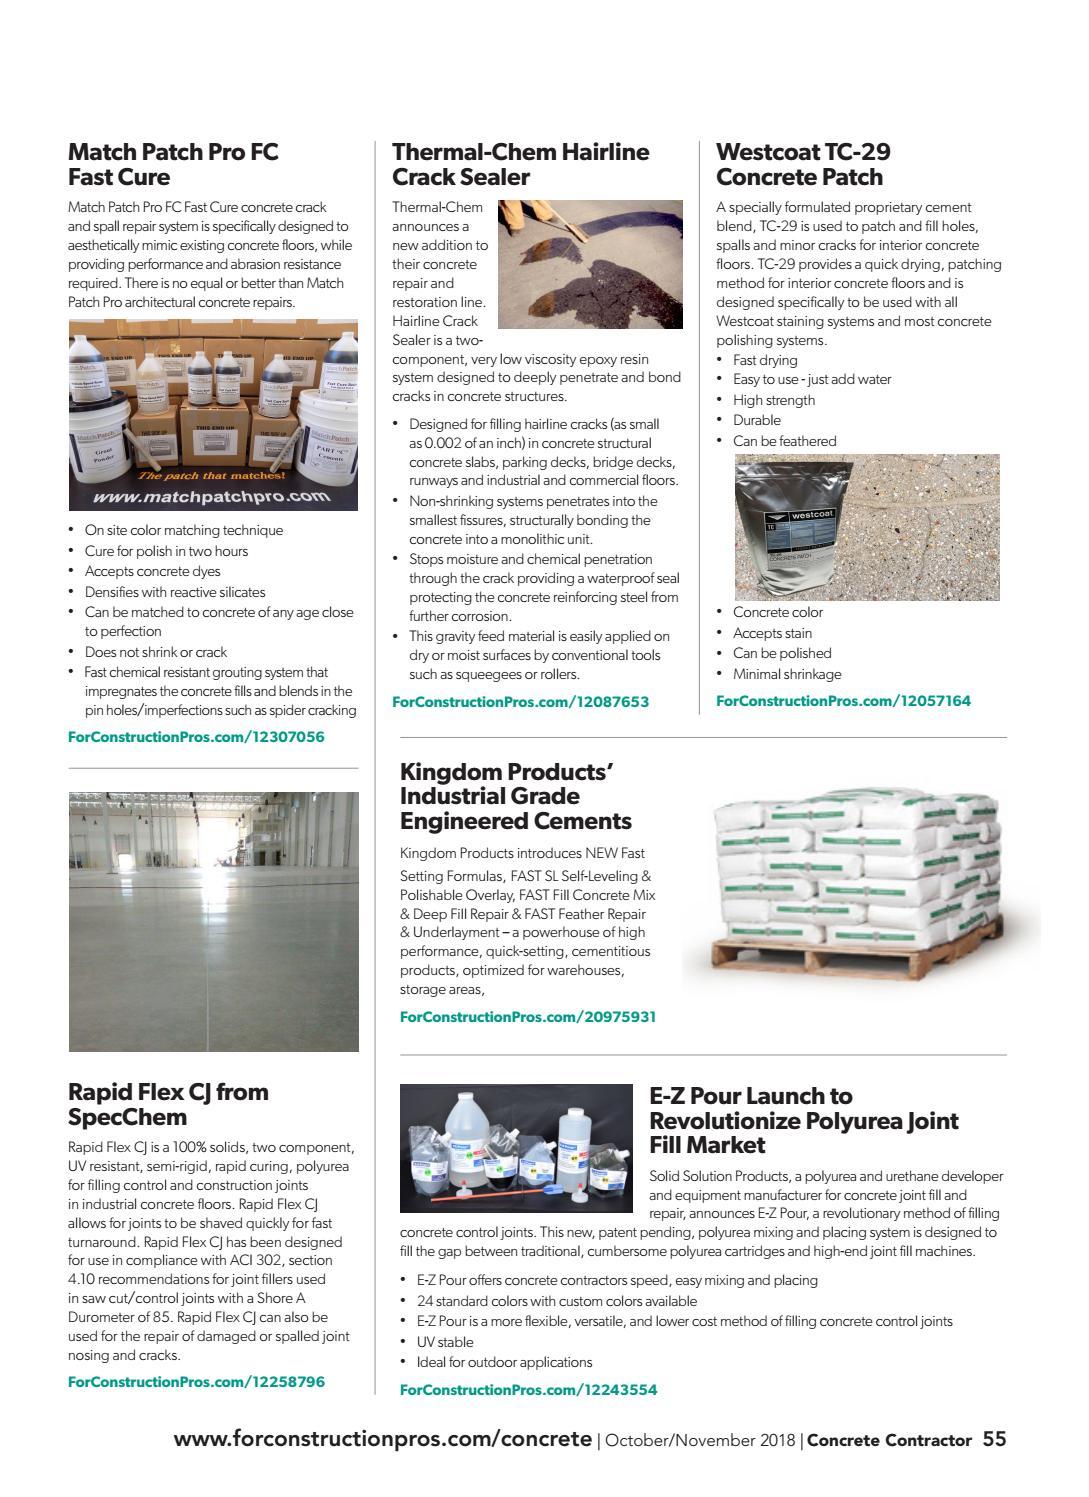 Concrete Contractor October/November 2018 by